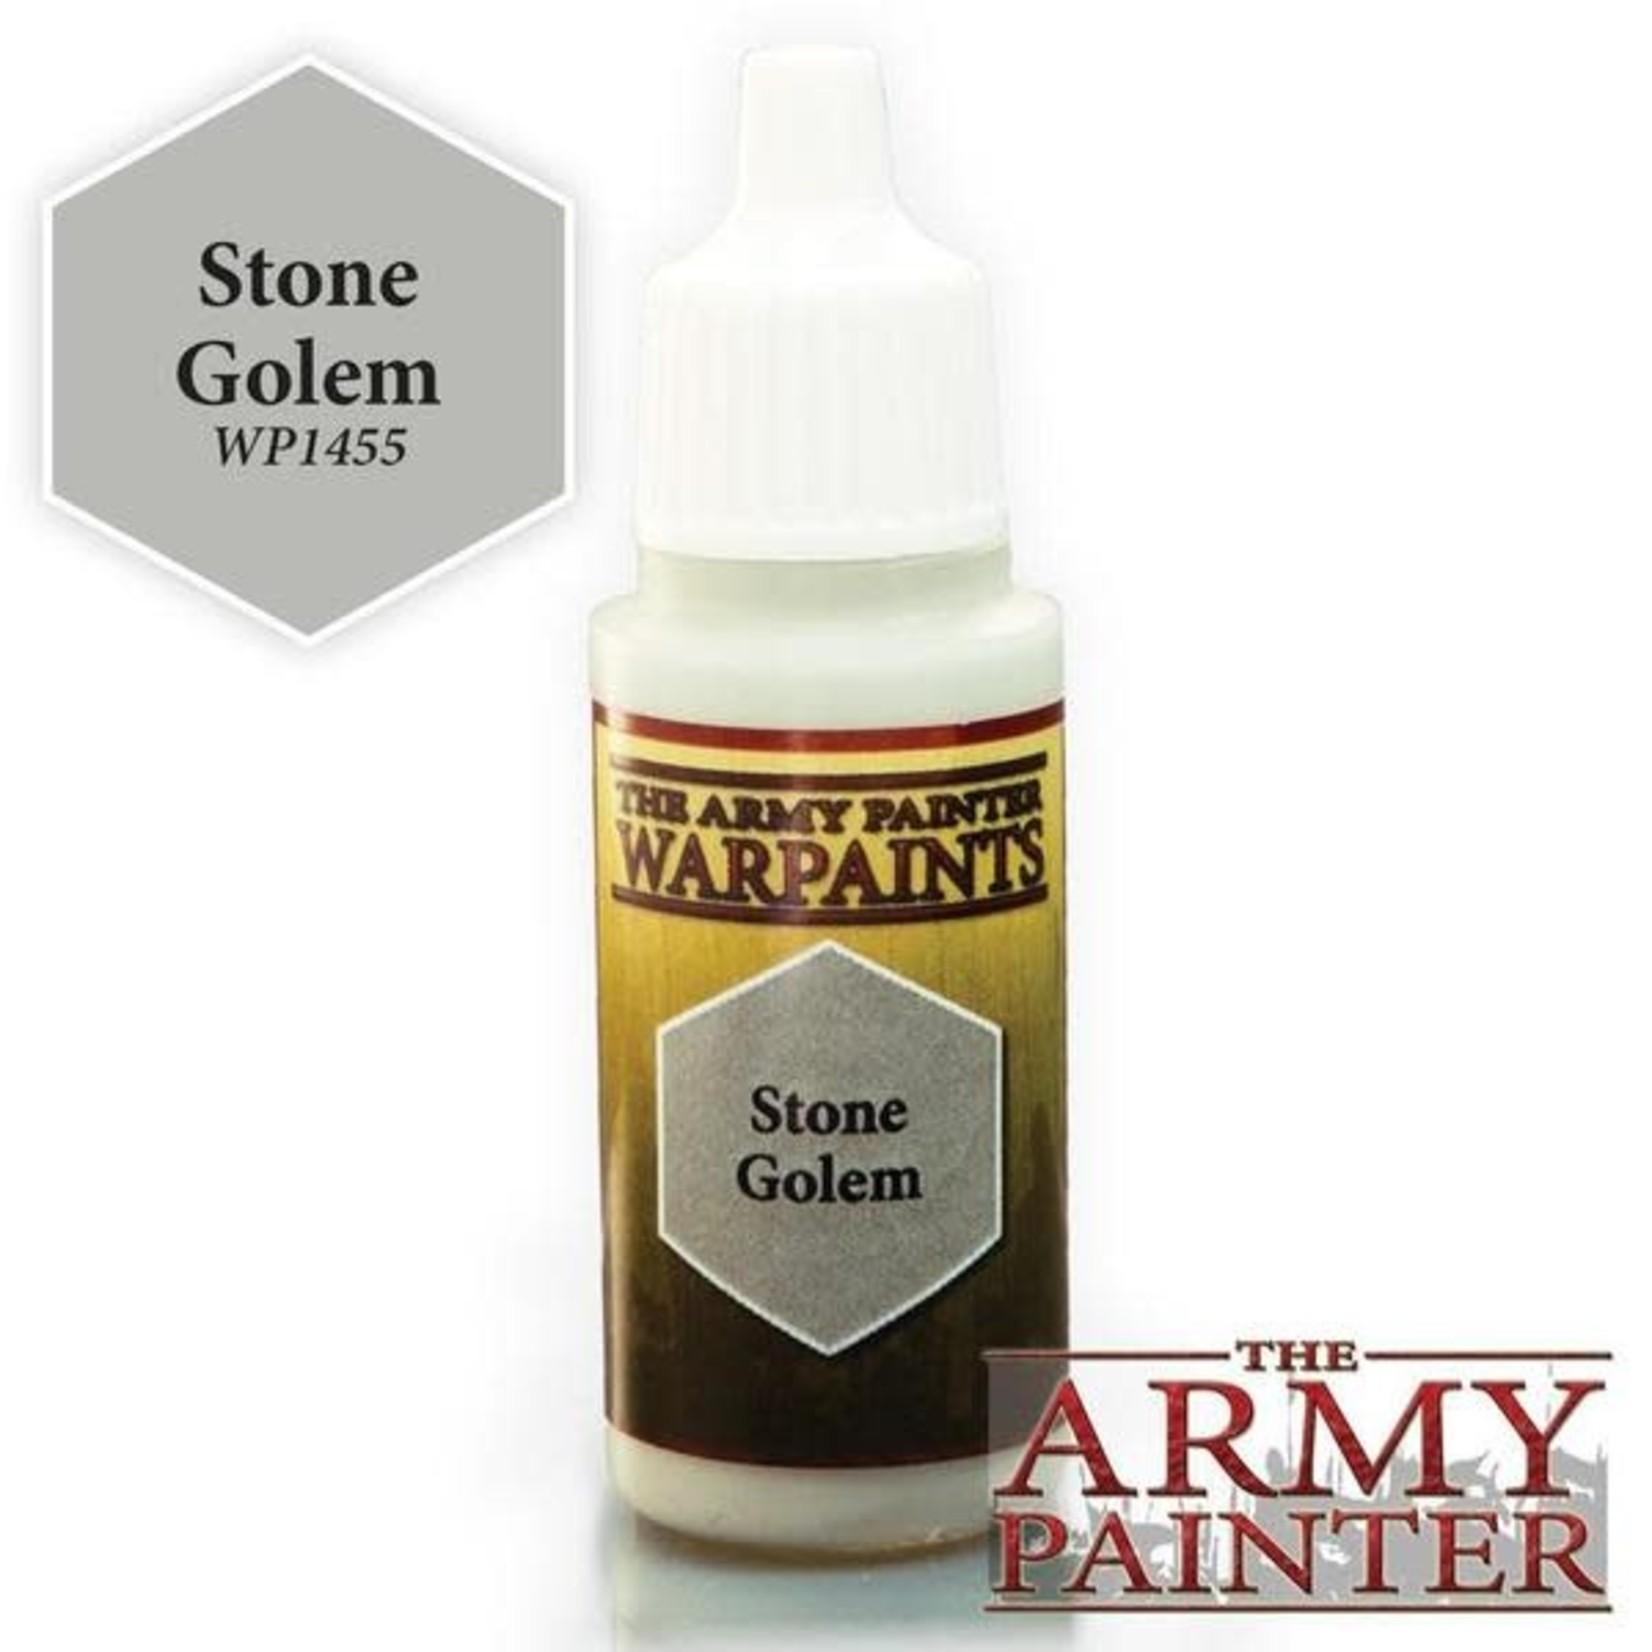 Army Painter APWP Stone Golem 18ml